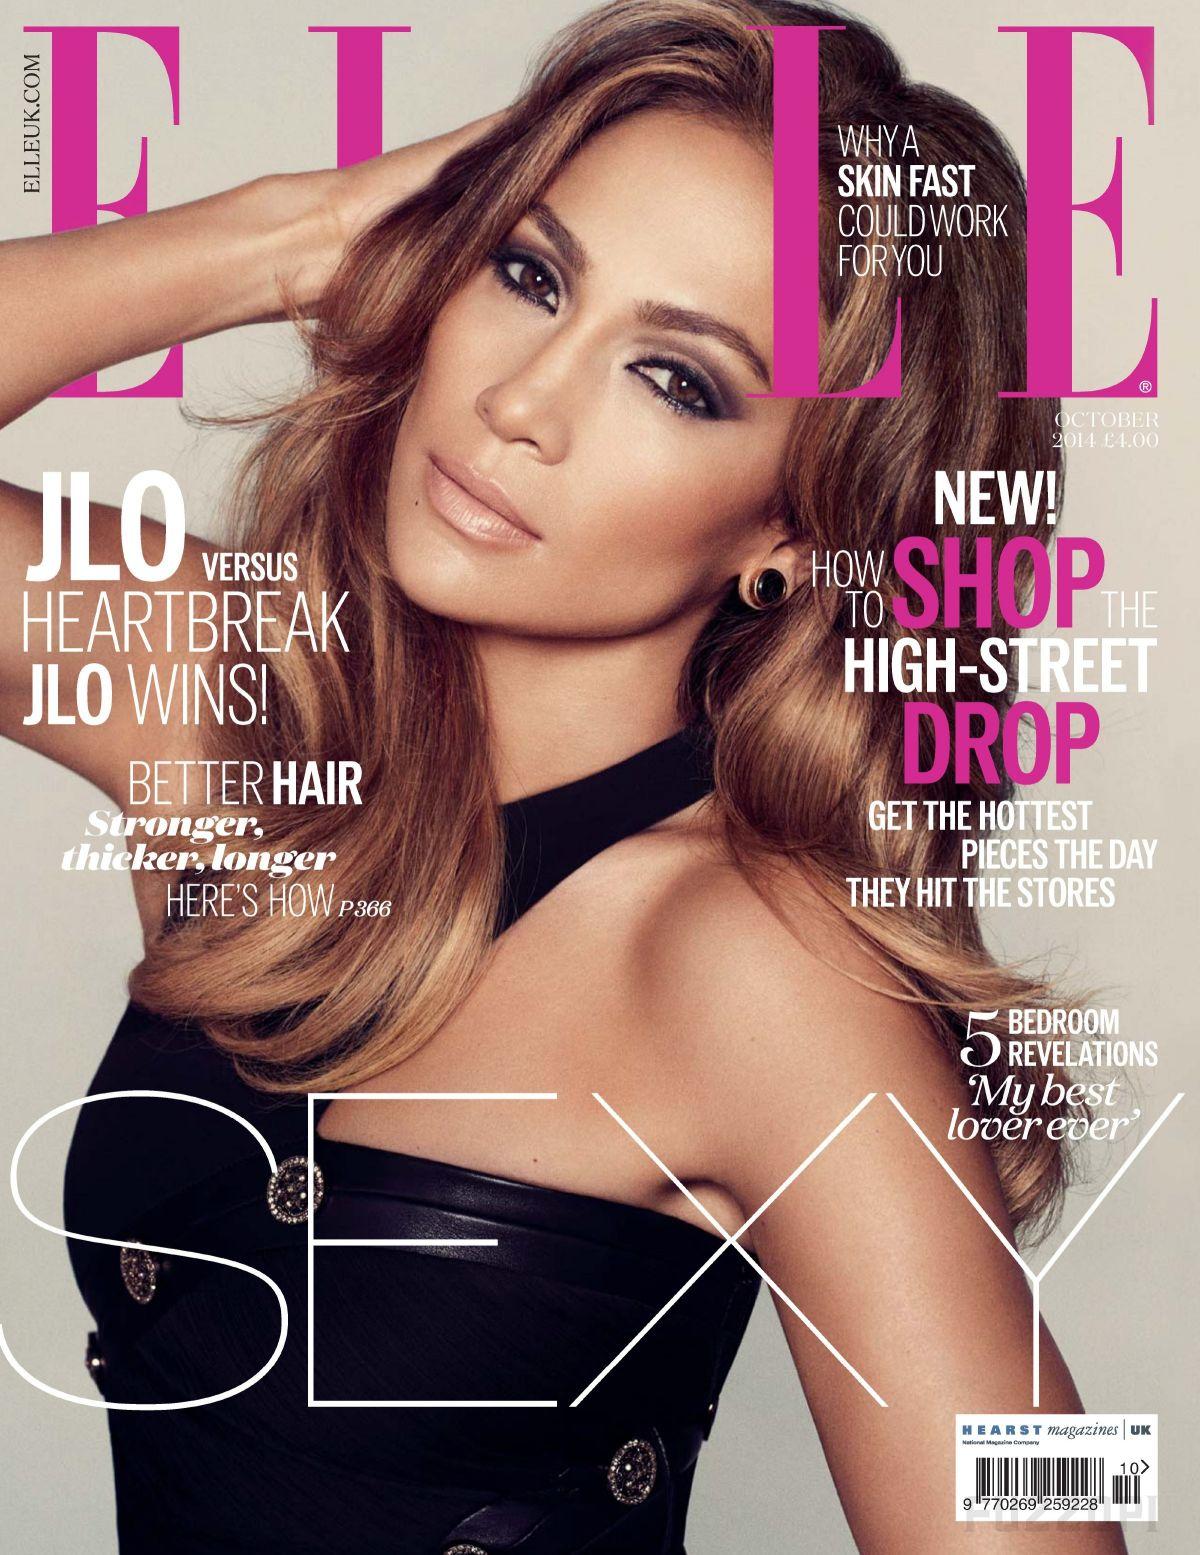 JENNIFER LOPEZ on the Cover of Elle Magazine, October 2014 Issue